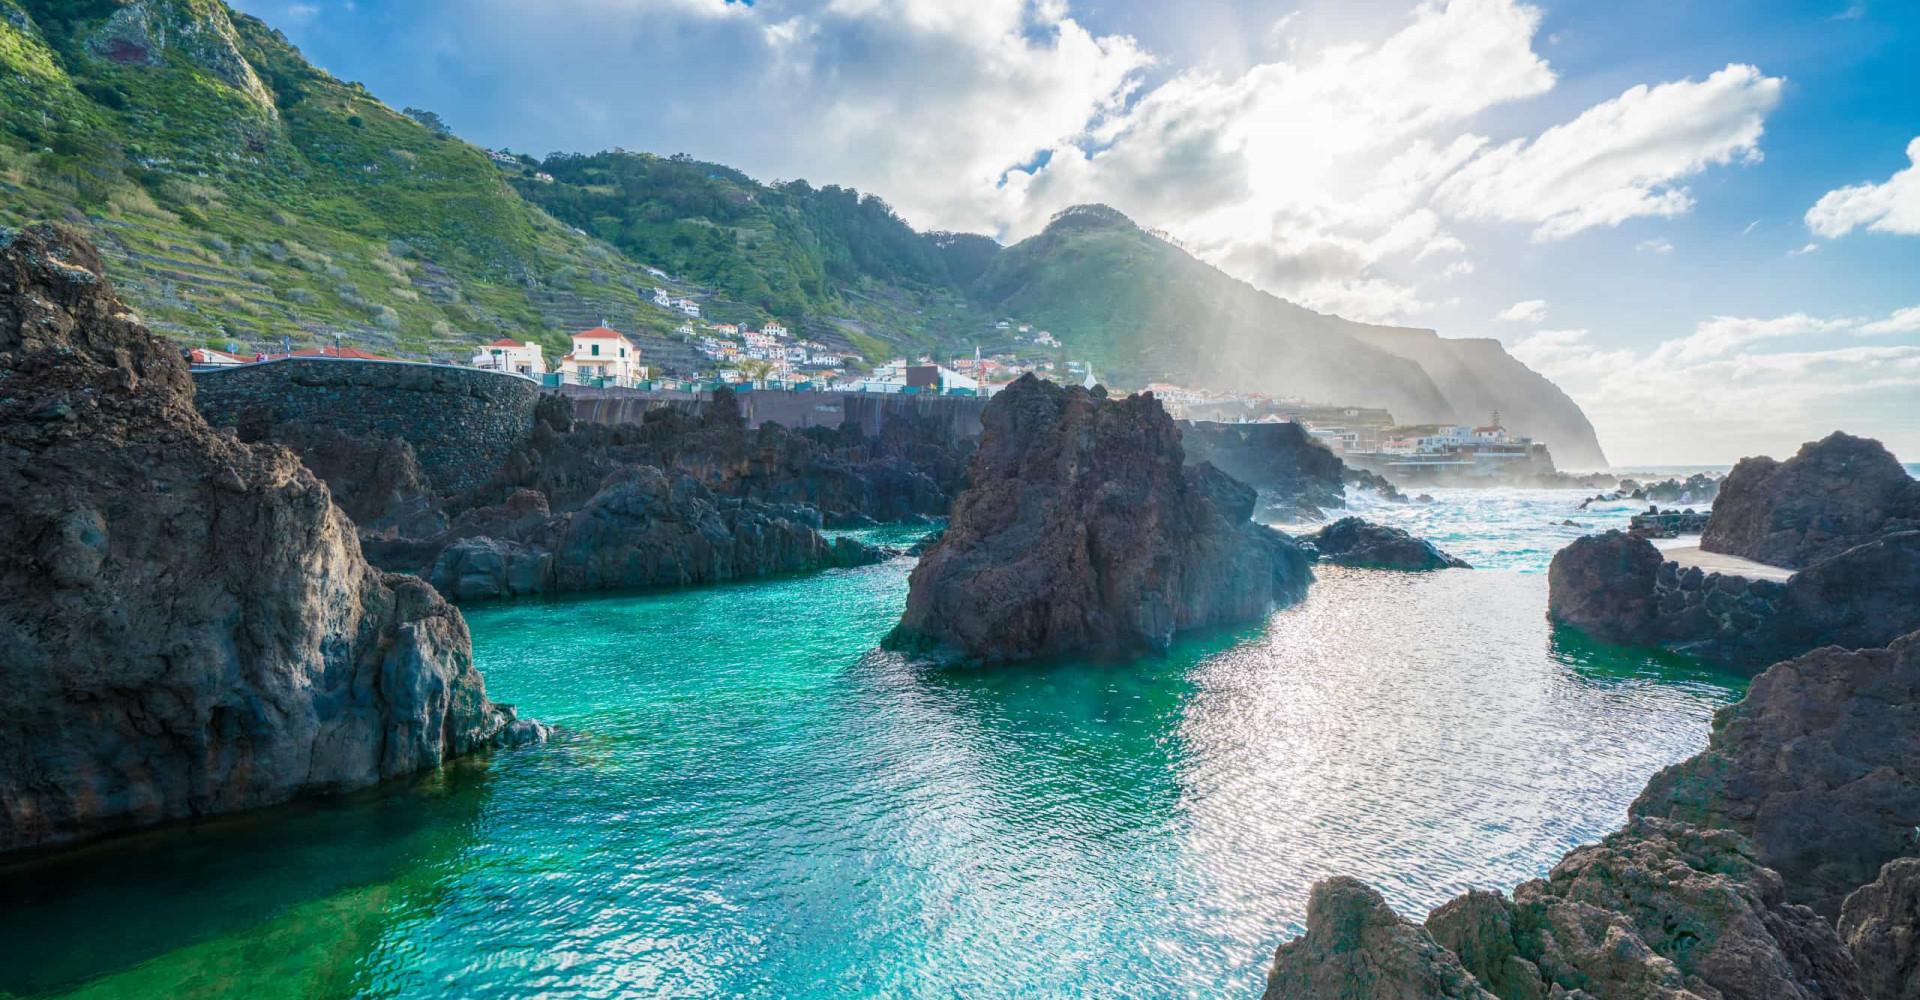 Dit is het mooiste eiland van Europa